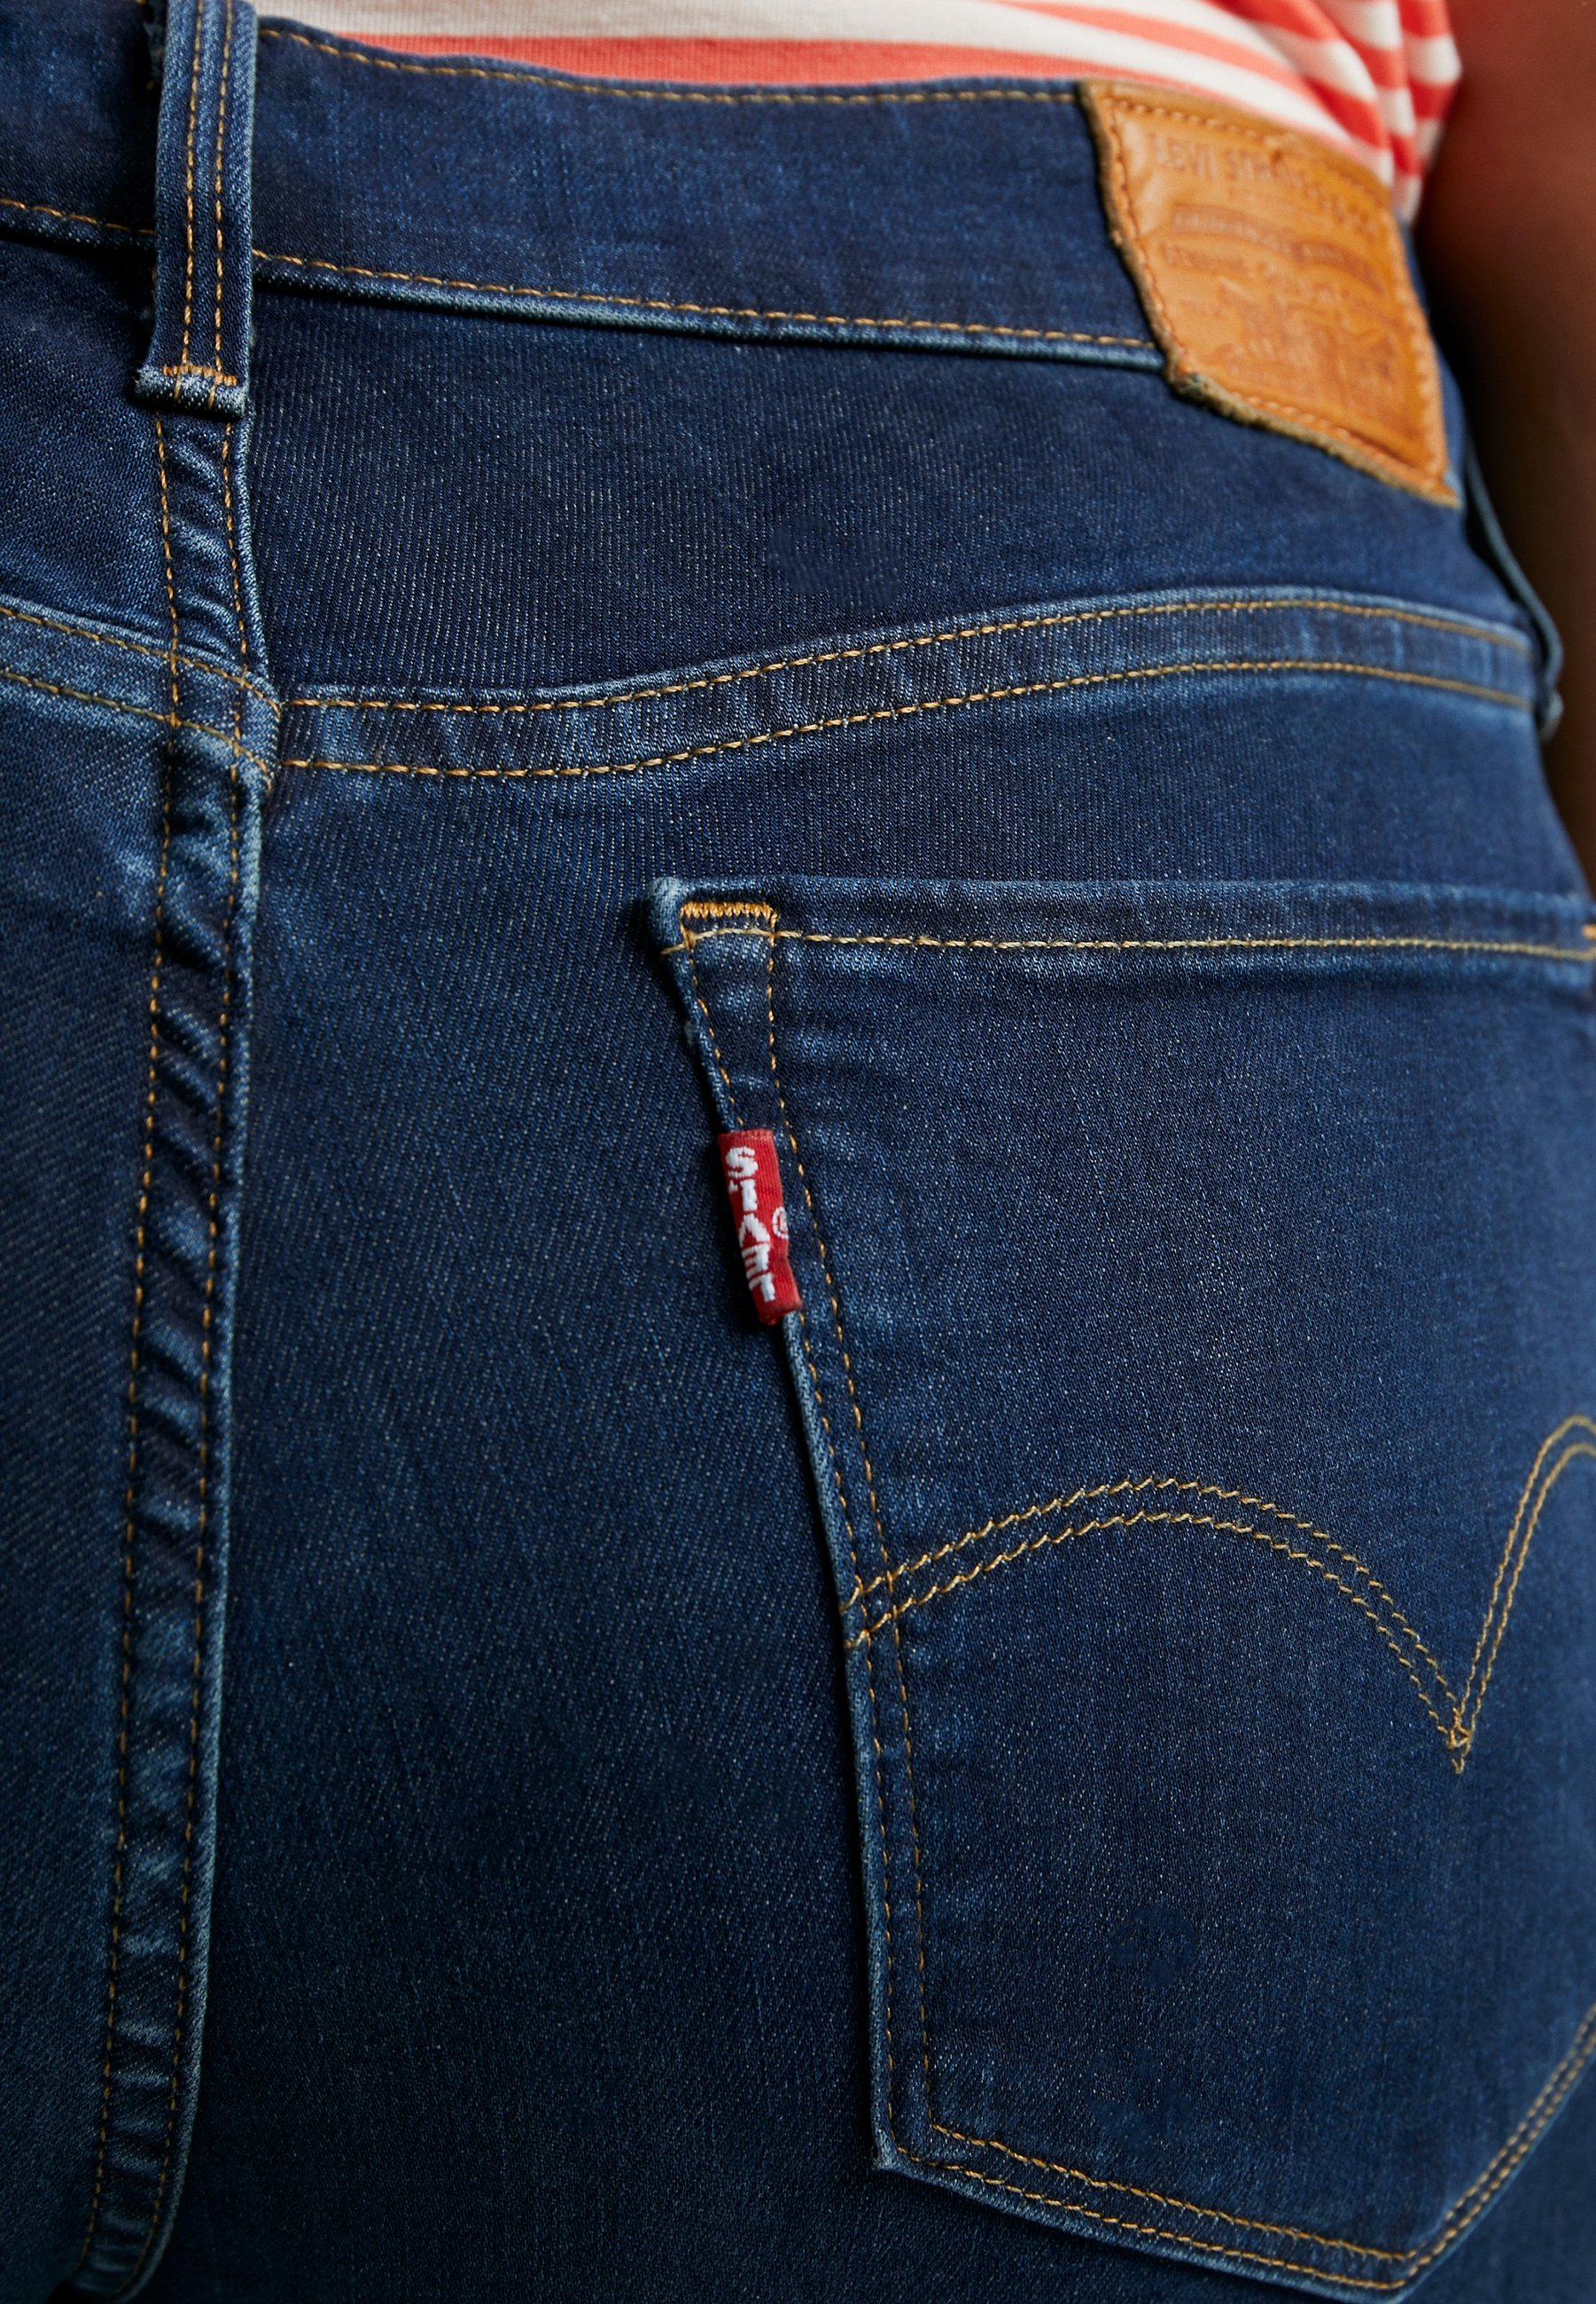 Levi's® SkinnyJeans Westbound Plus Shping 310 Pl Spr Fit JlFKu1cT3